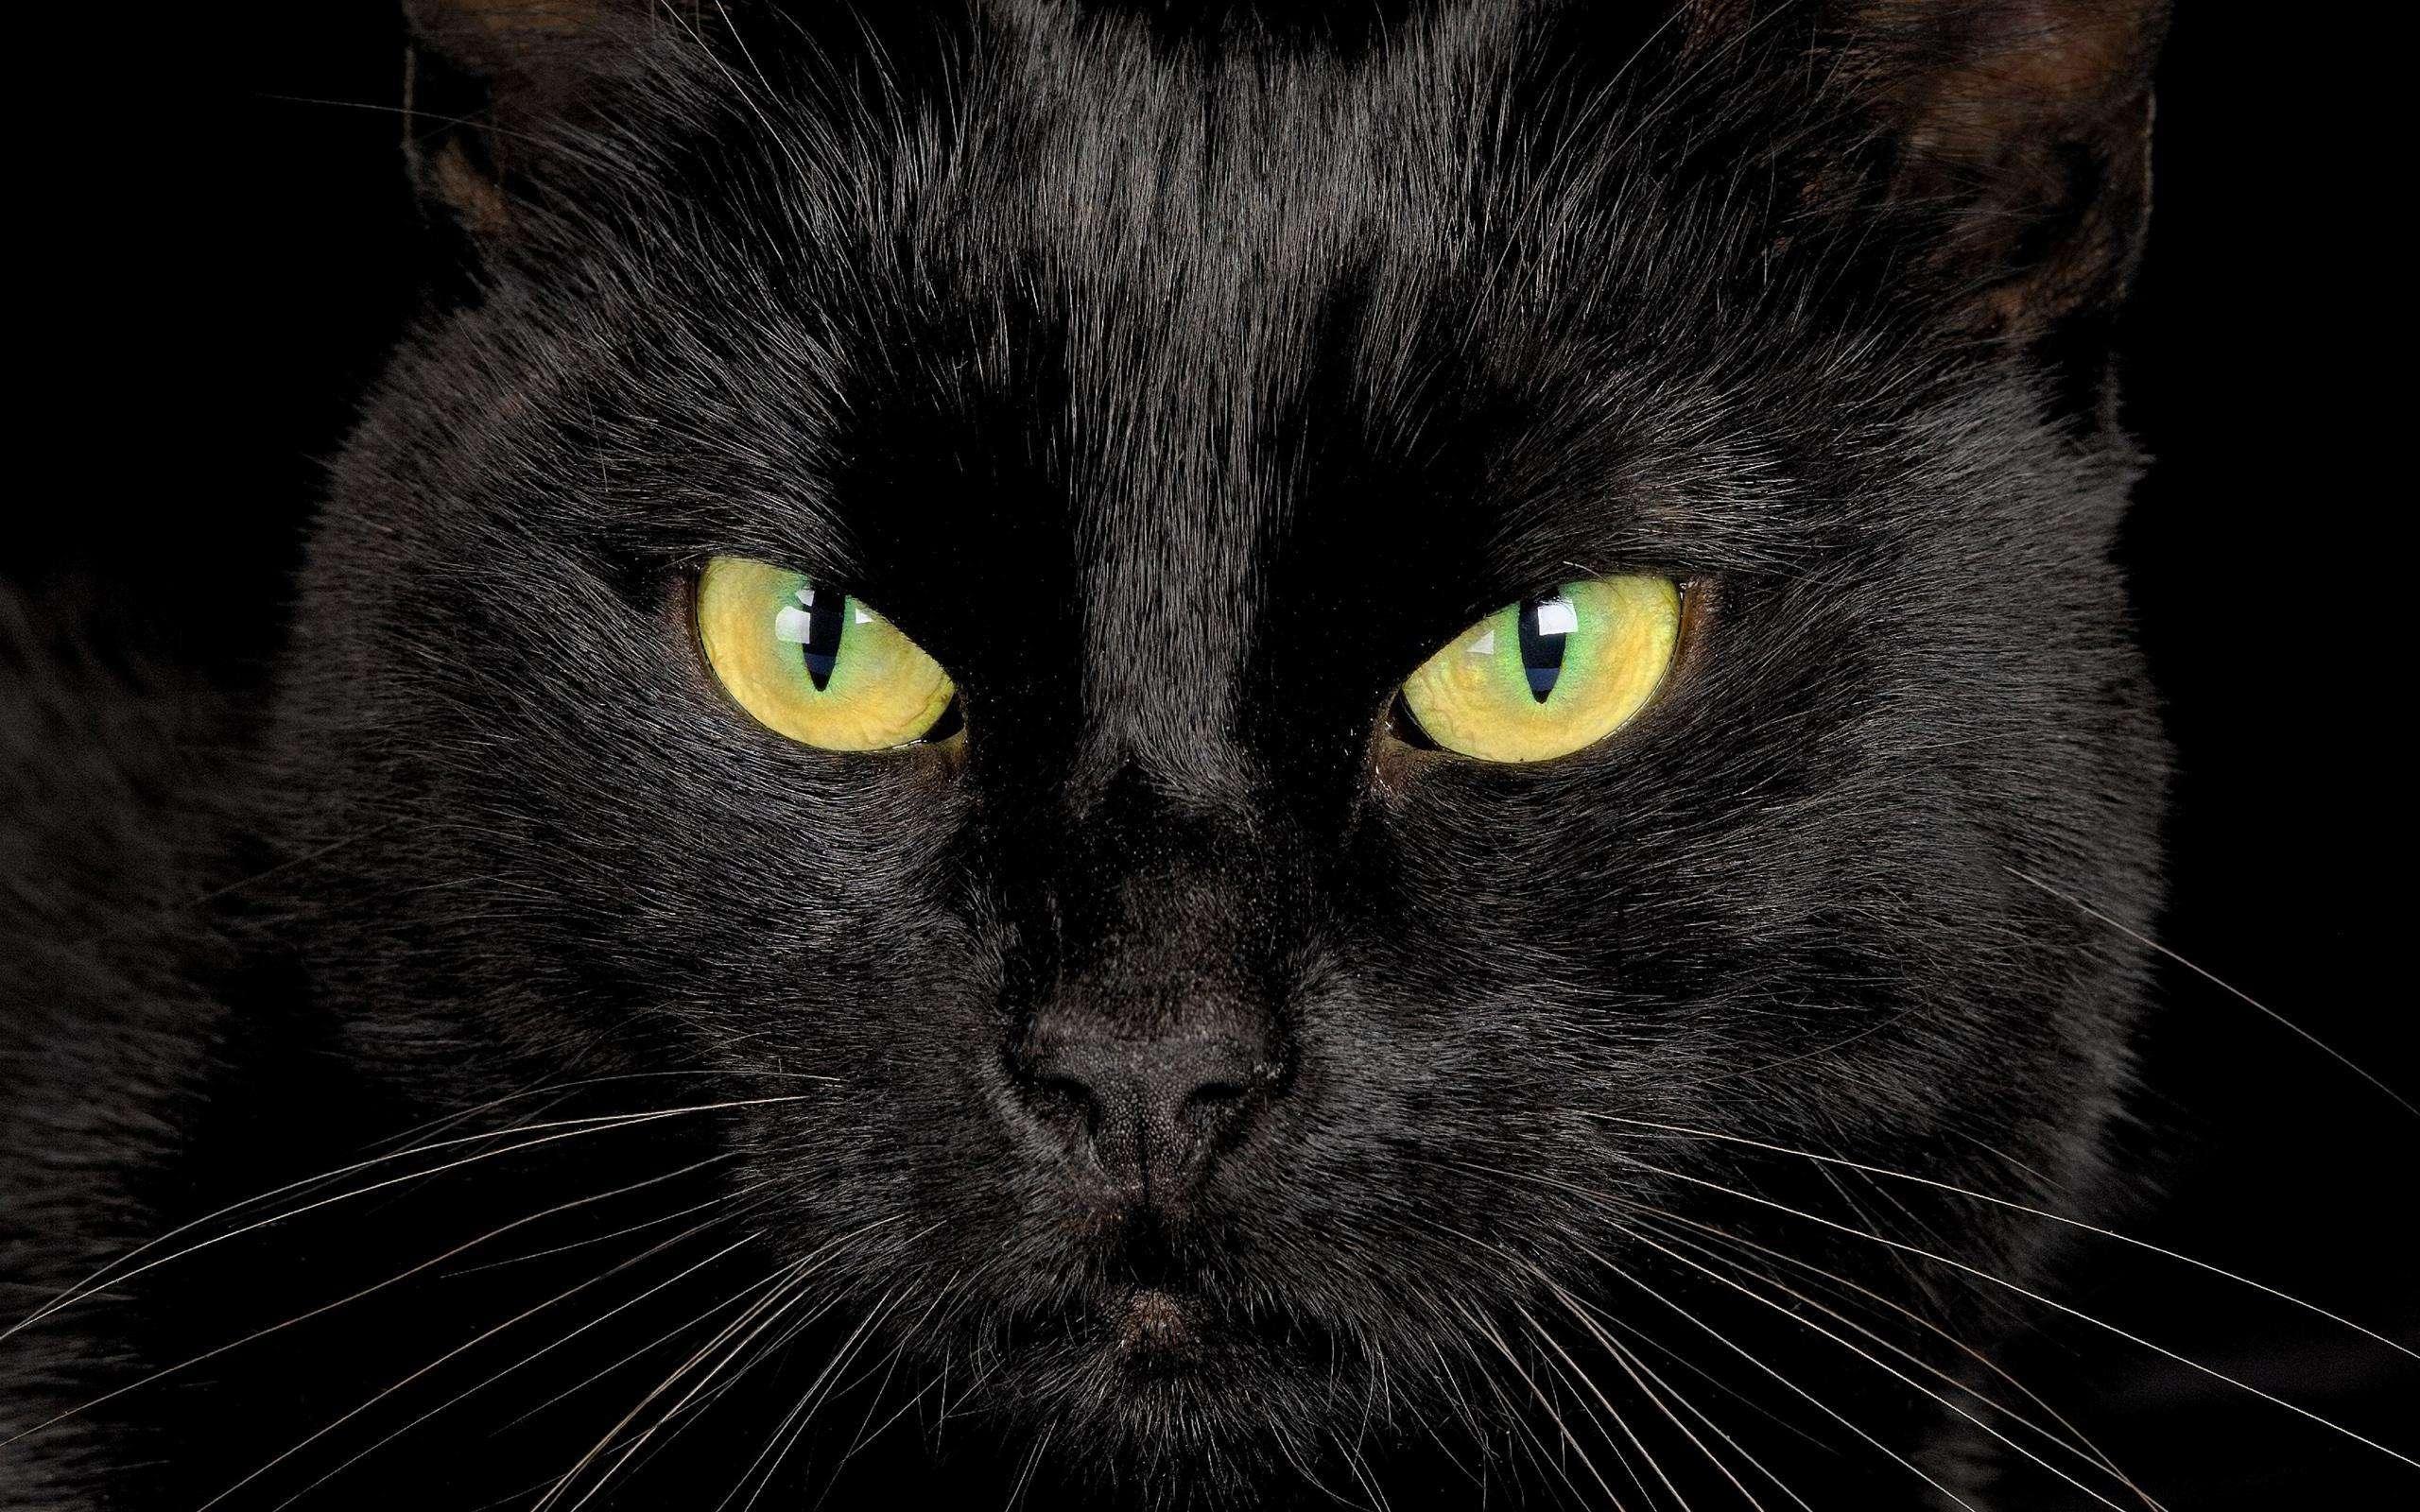 Ver gato preto na sexta-feira 13, dá azar;